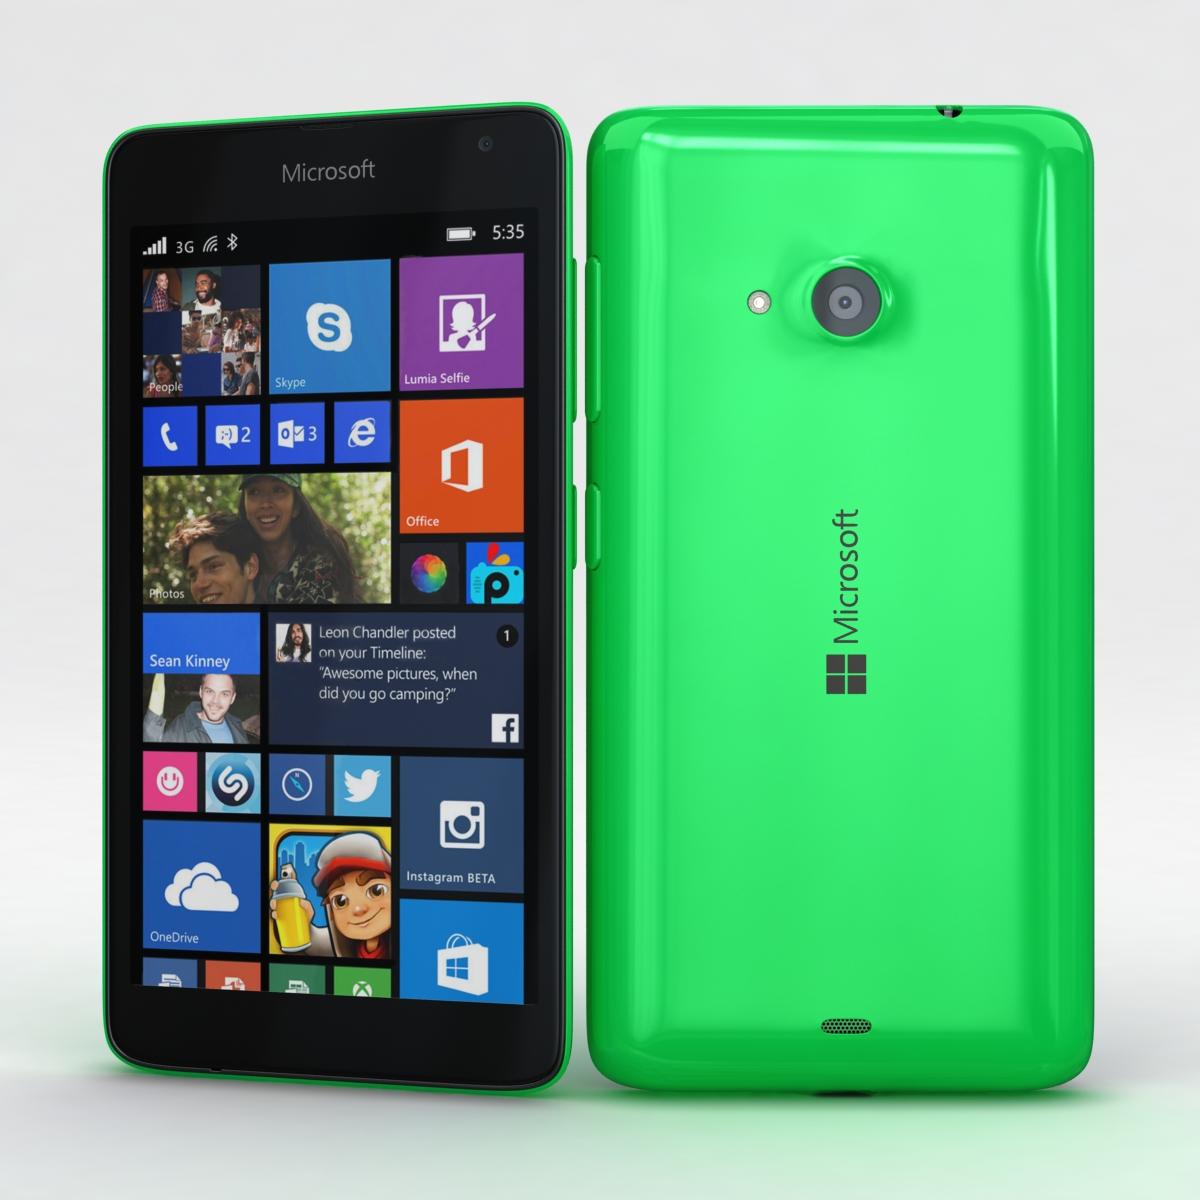 Microsoft Lumia 535 and Dual SIM Green 3d model 3ds max fbx c4d obj 204164